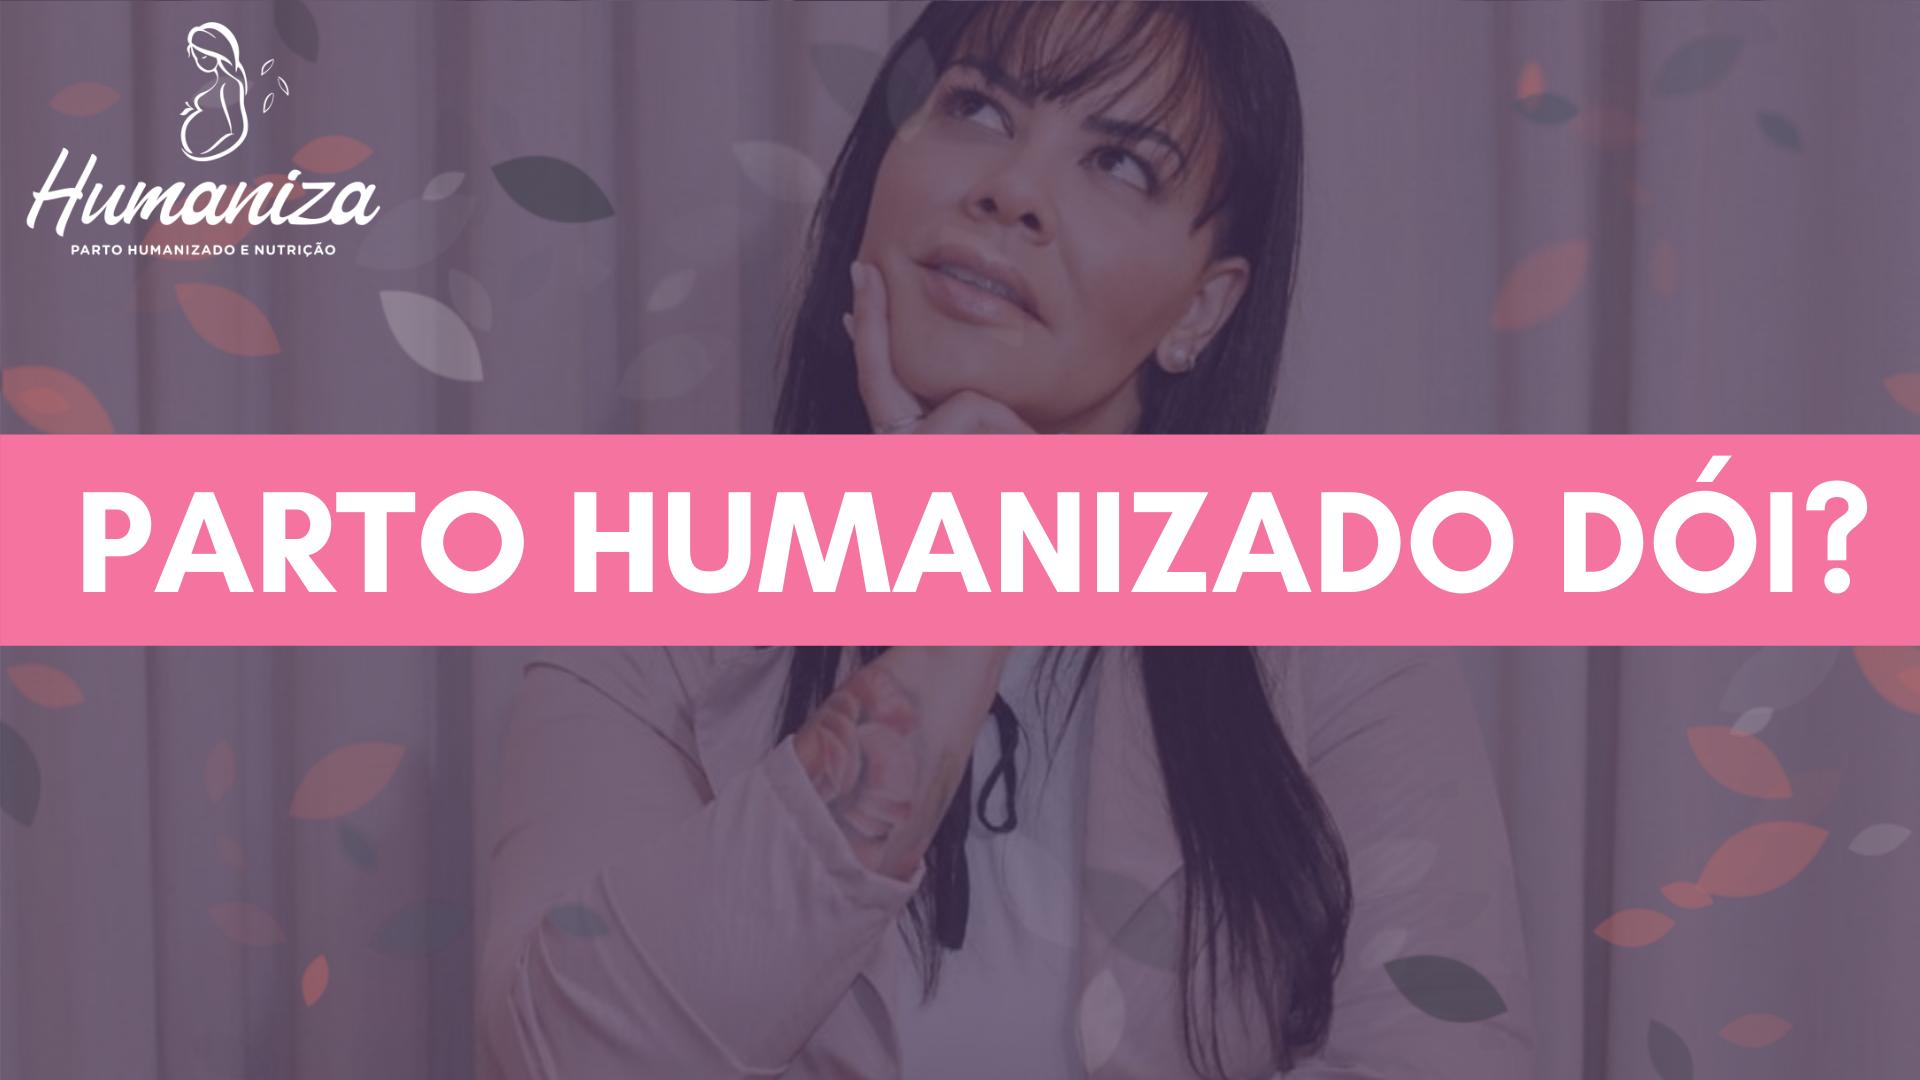 Parto Humanizado Dói - Melissa Martinelli - Humaniza Brasília - DF